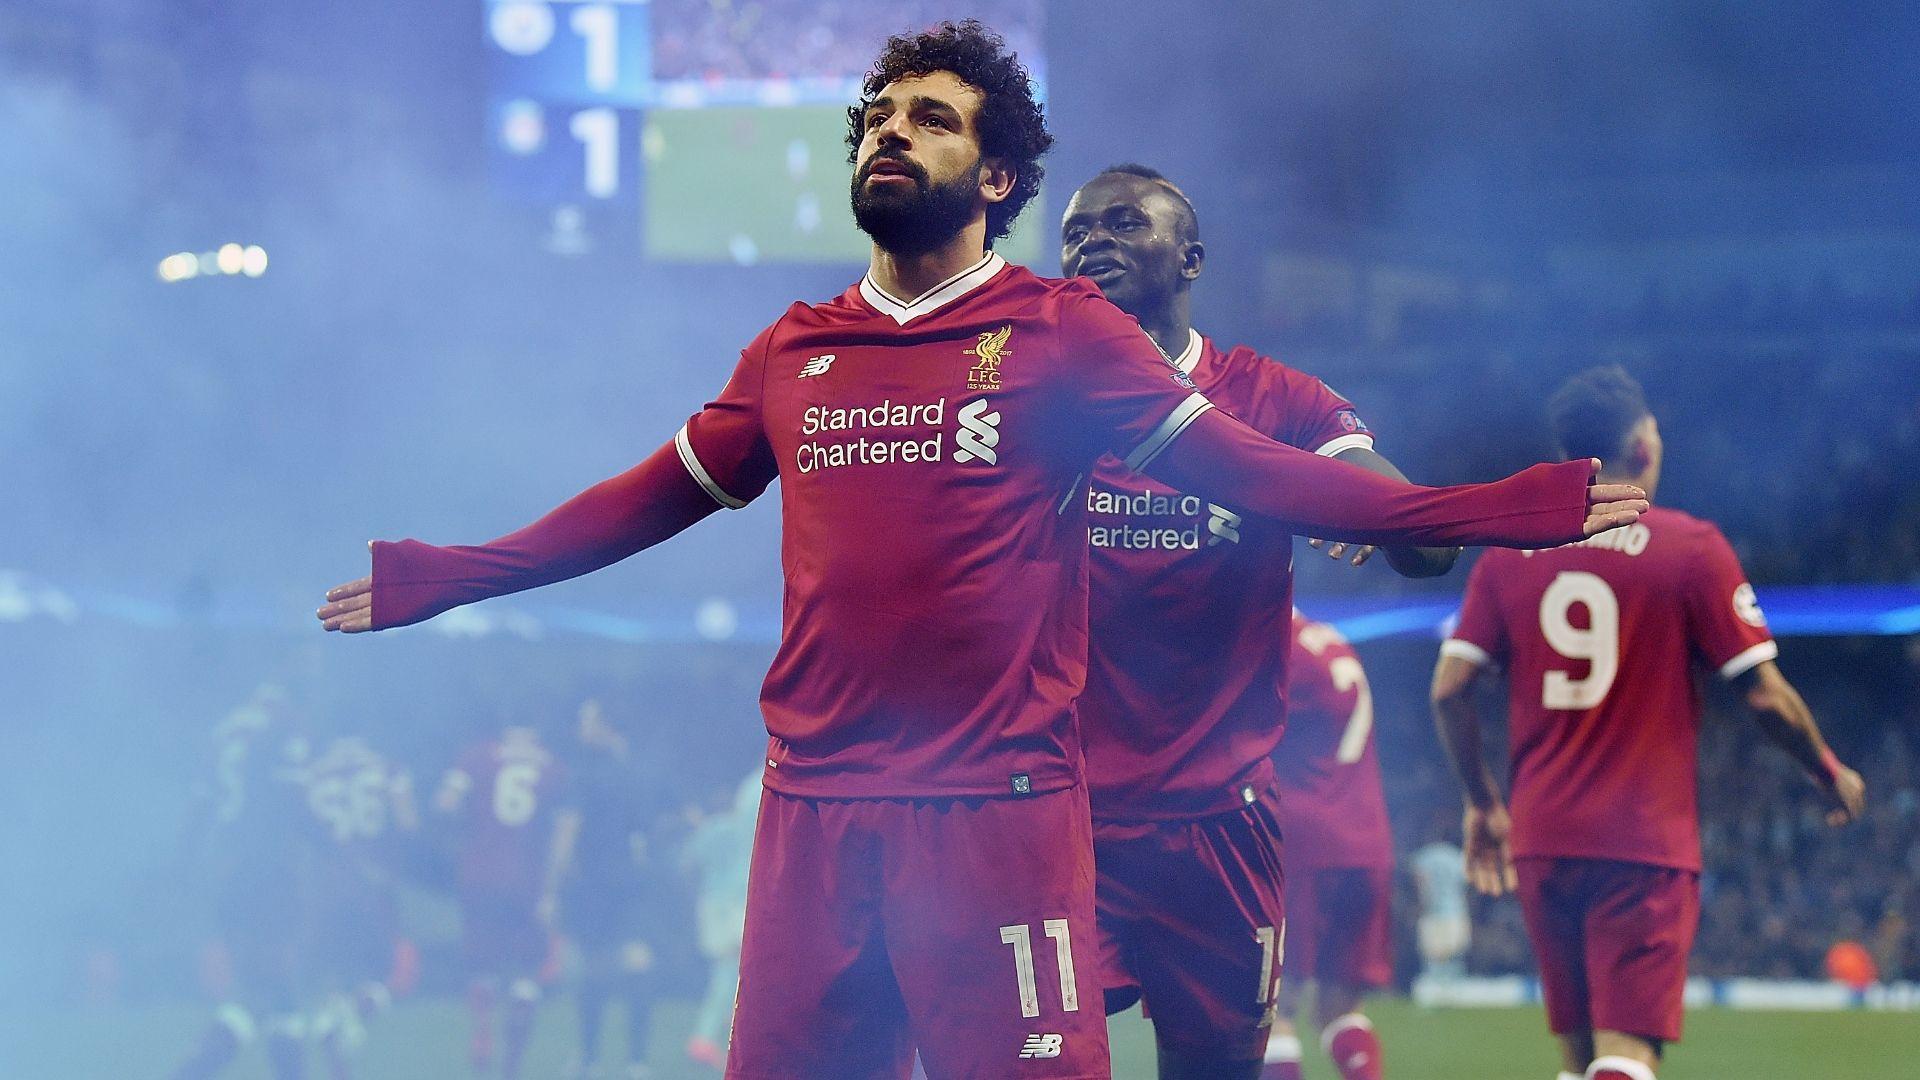 Salah, Firmino Make History With Goals Vs. City